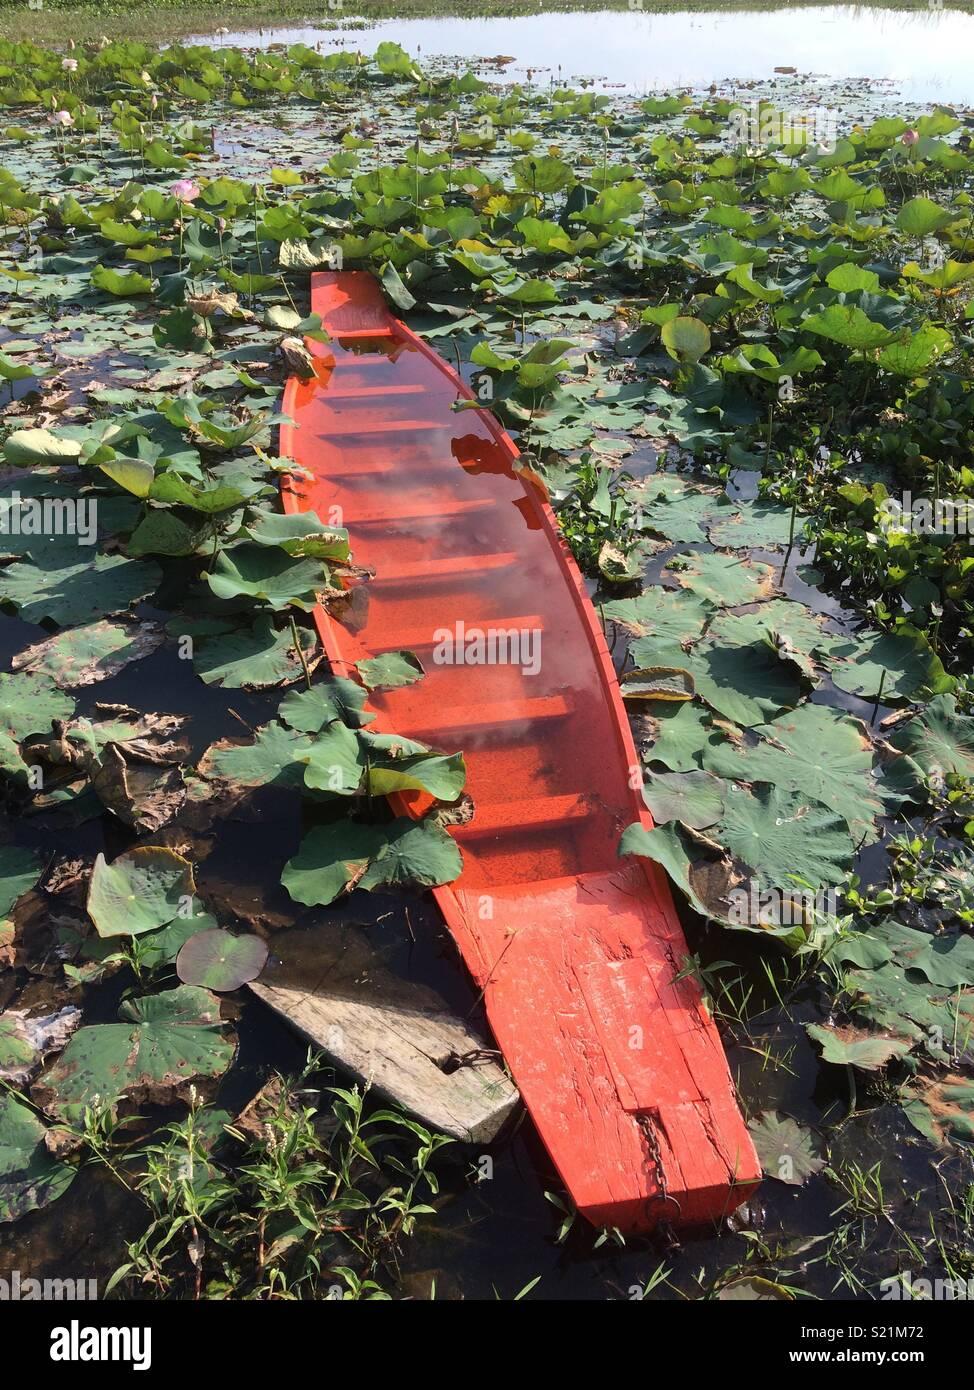 Sunken boat in Buriram Thailand - Stock Image